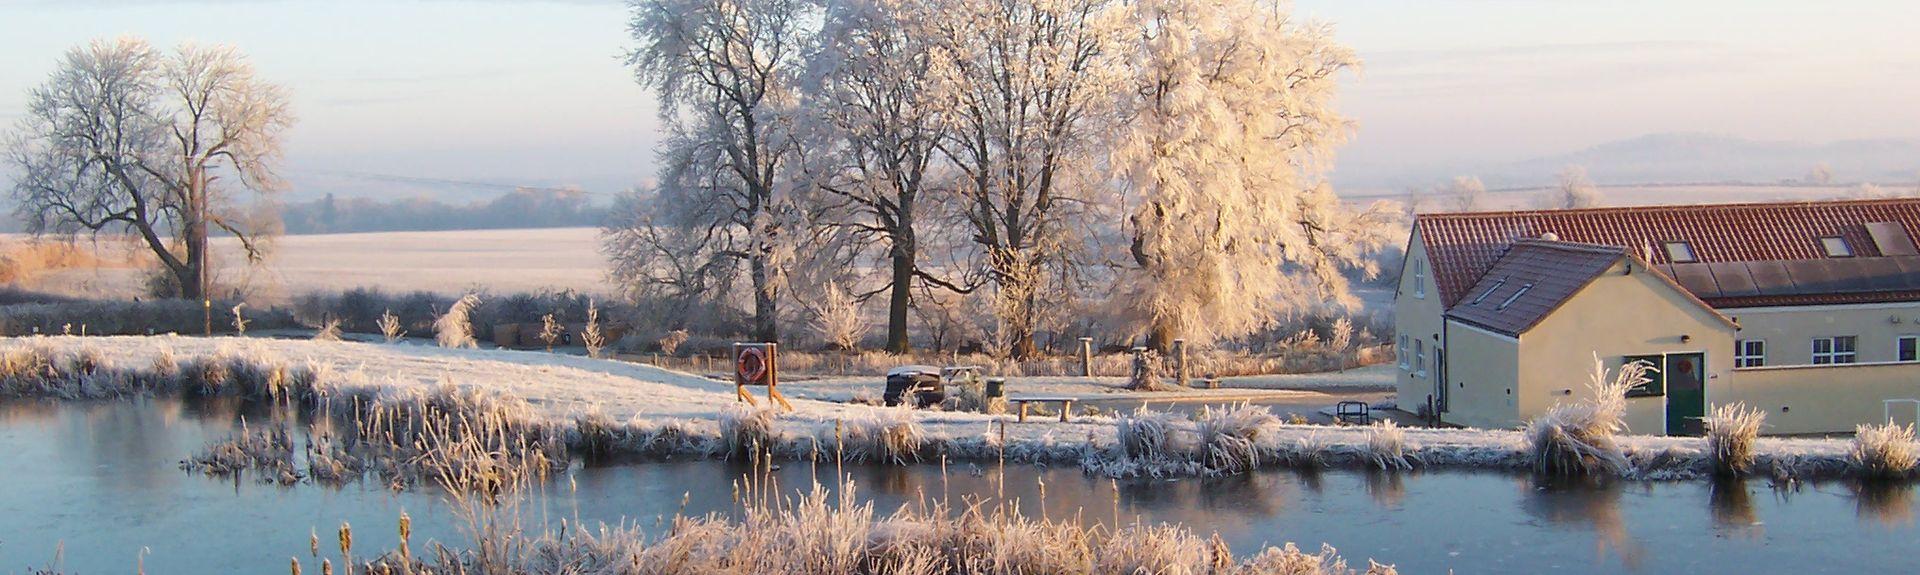 Hagworthingham, Angleterre, Royaume-Uni